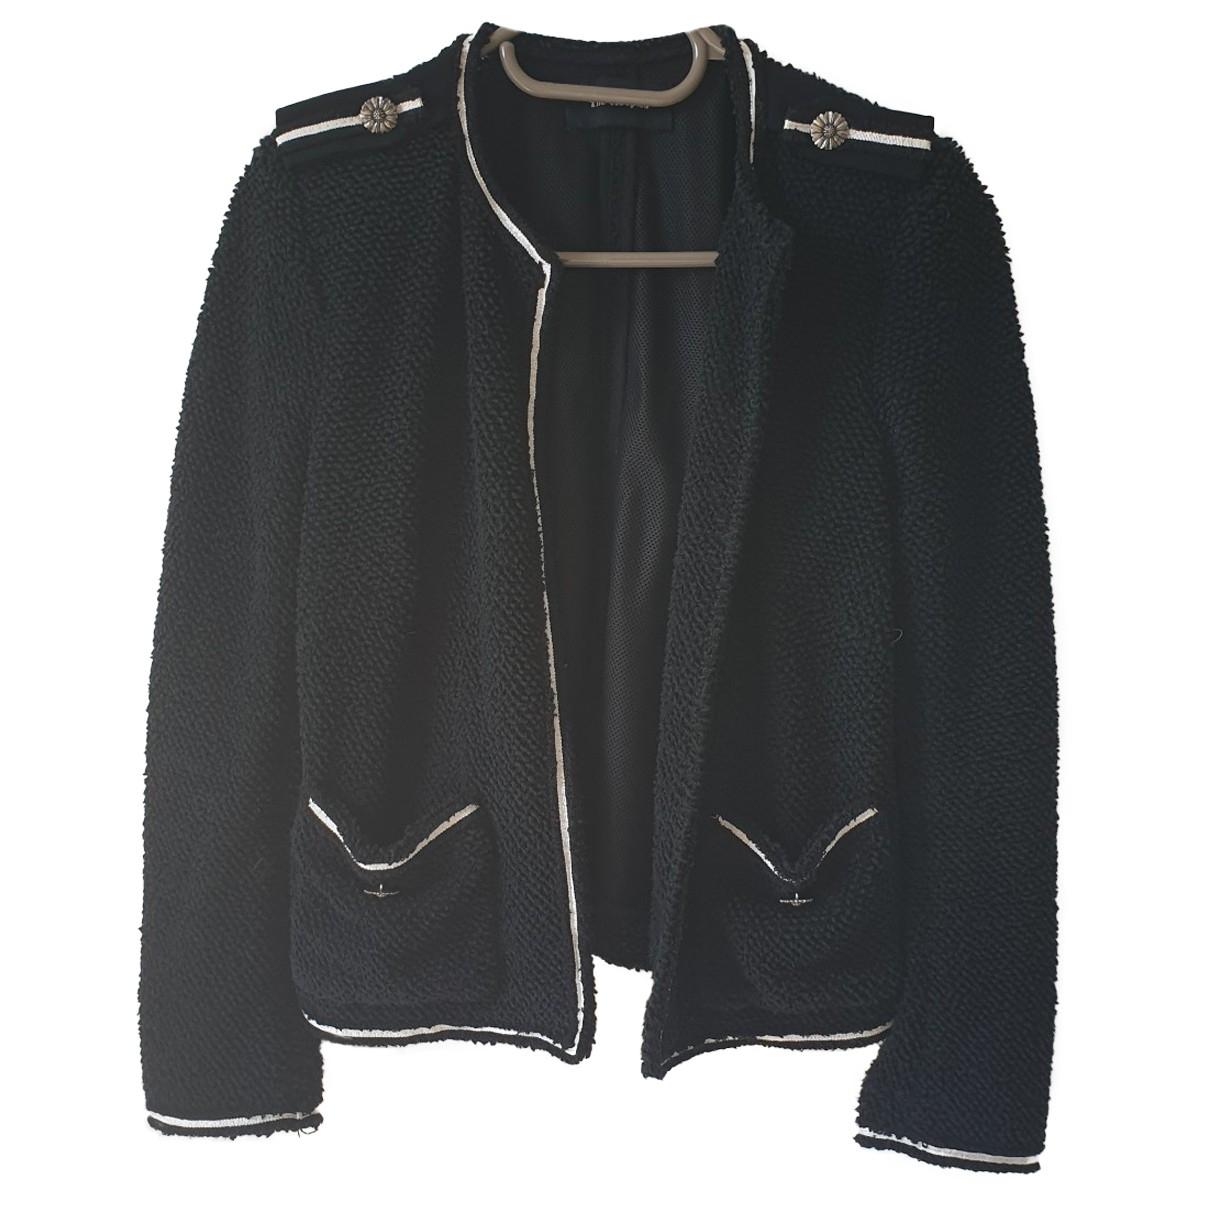 The Kooples \N Black Cotton jacket for Women 36 FR